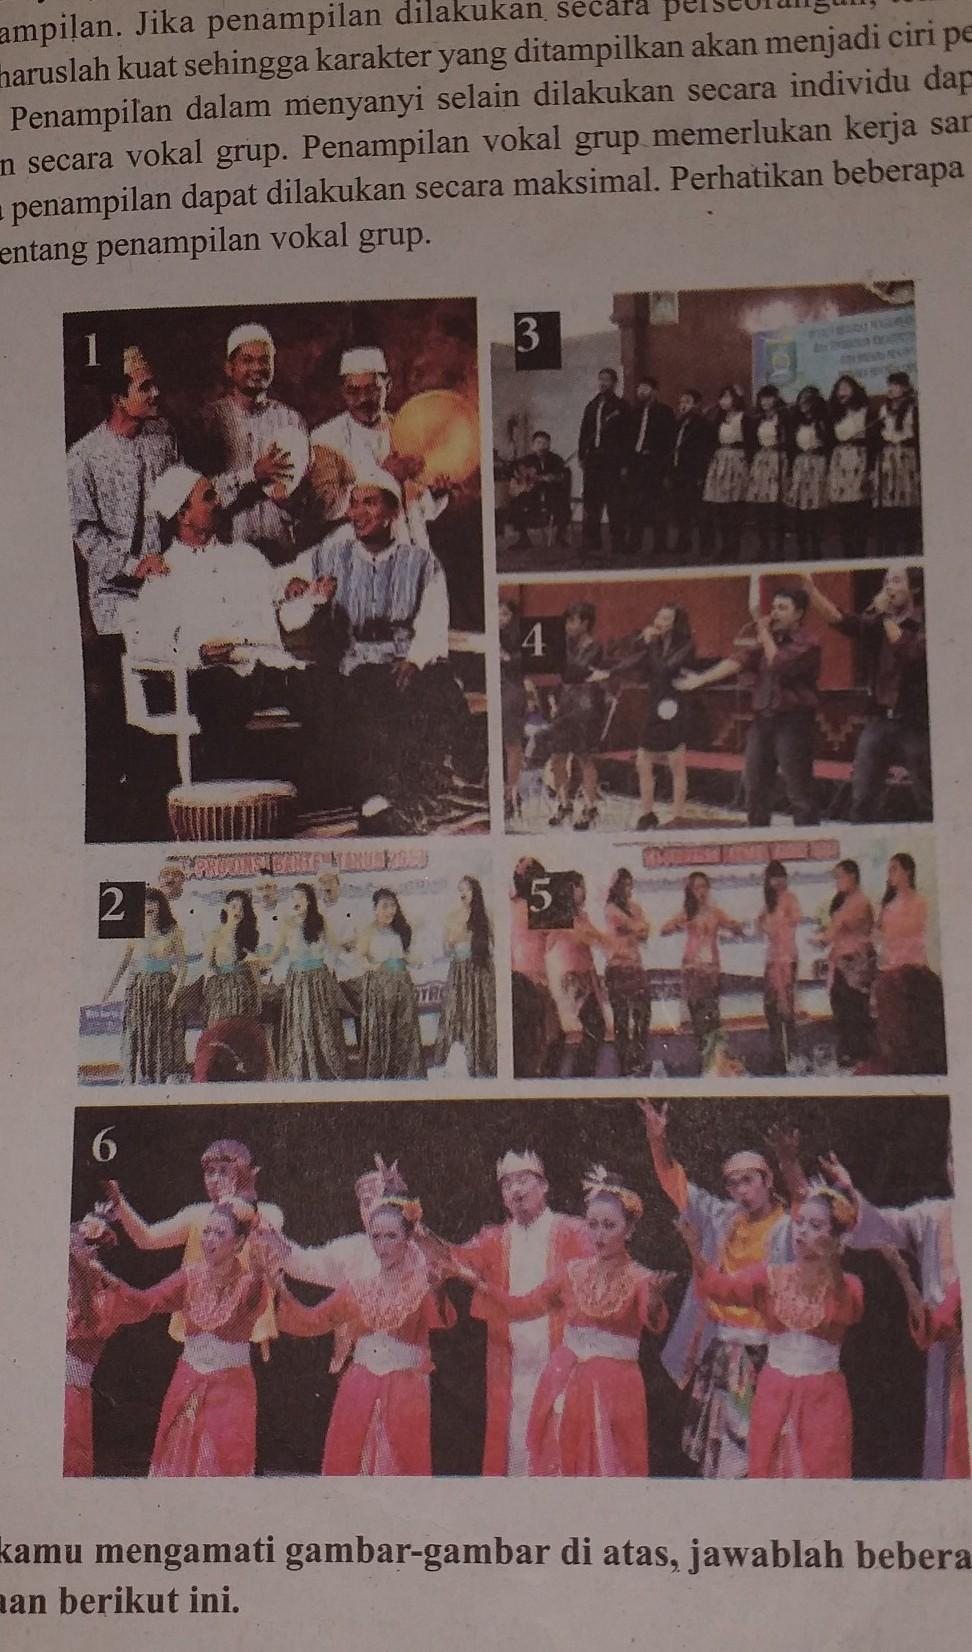 Contoh Lagu Kanon : contoh, kanon, Gambar, Diatas, Manakah, Termasuk, Nasyid,akapela,vokal, Grup,koor,dan, Kanon?, Tentang, Brainly.co.id